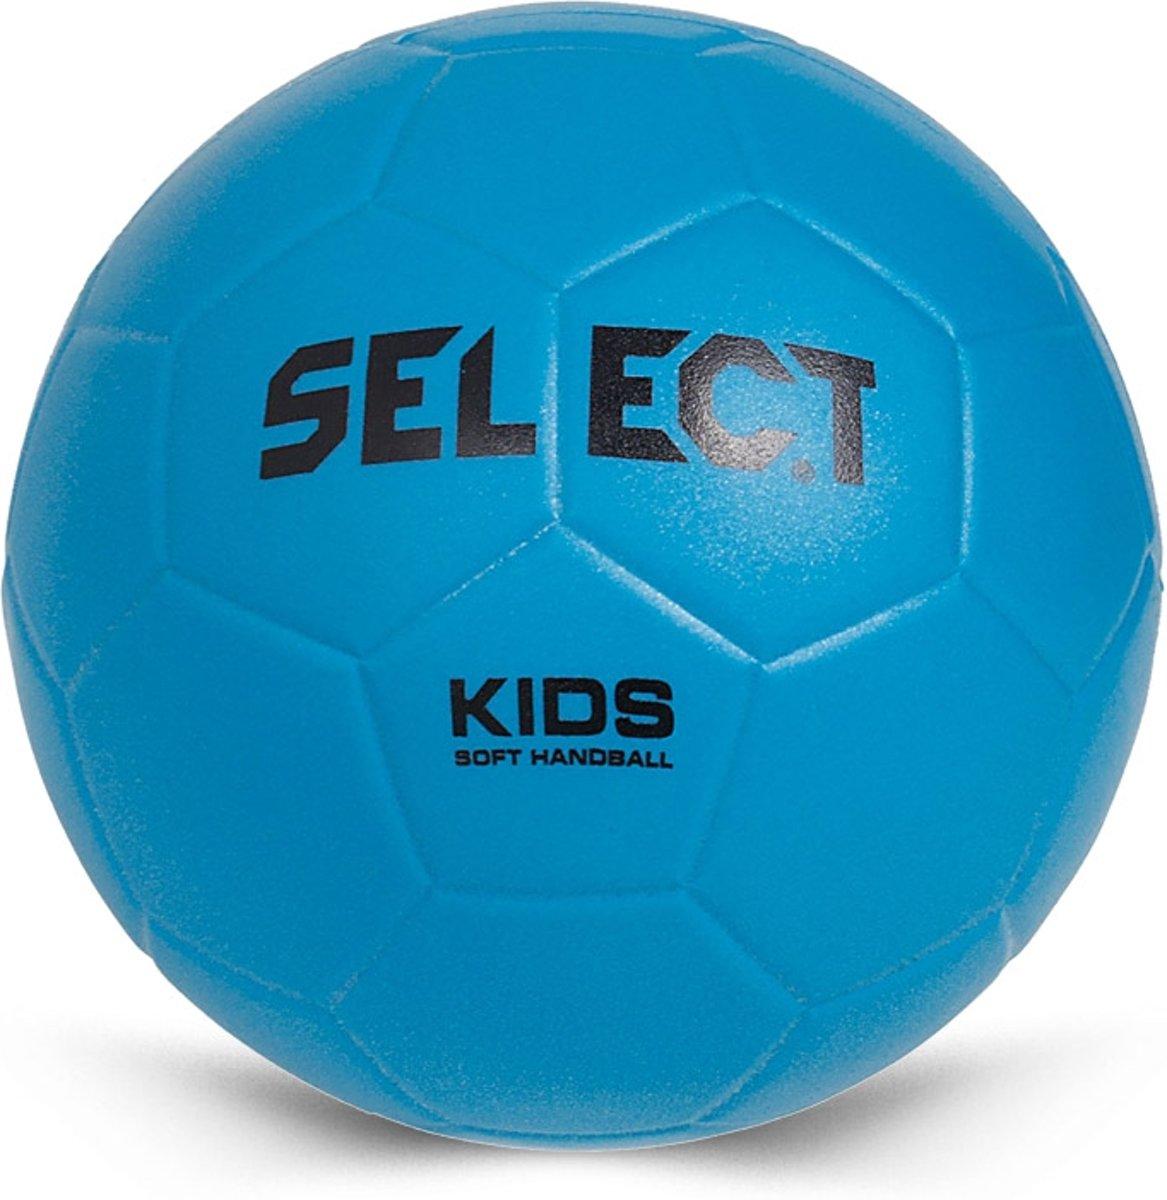 Select Kids Soft Handbal - Ballen  - blauw - ONE kopen